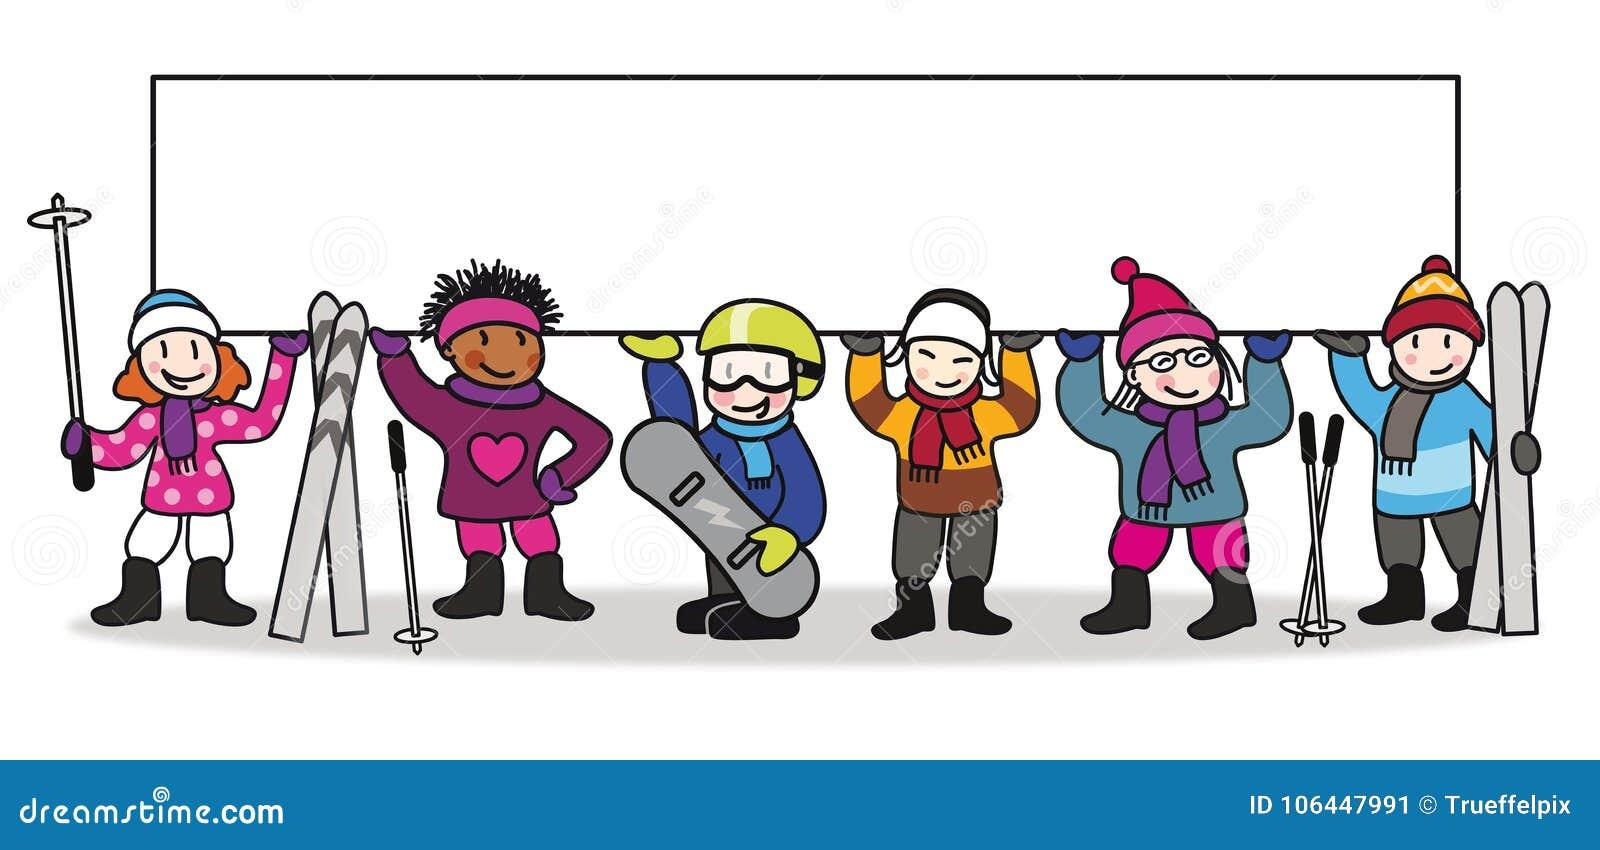 Ski resort colorful illustration with children